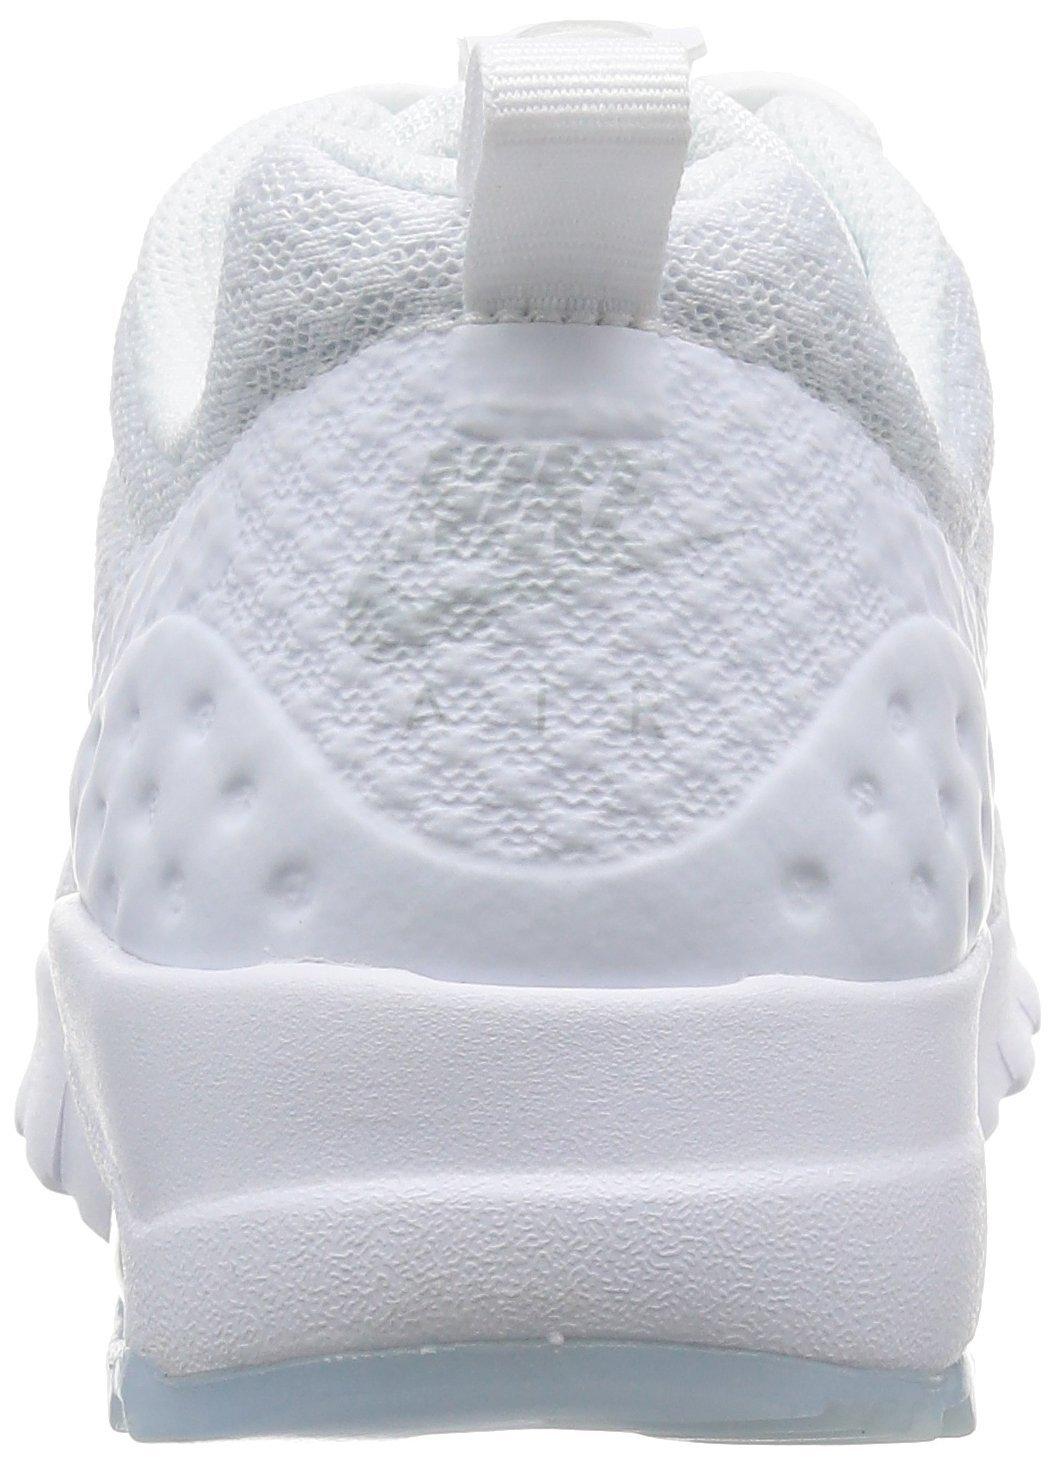 NIKE Women's Air Max Motion LW Running Shoe, White/White, 8.5 M US by NIKE (Image #2)